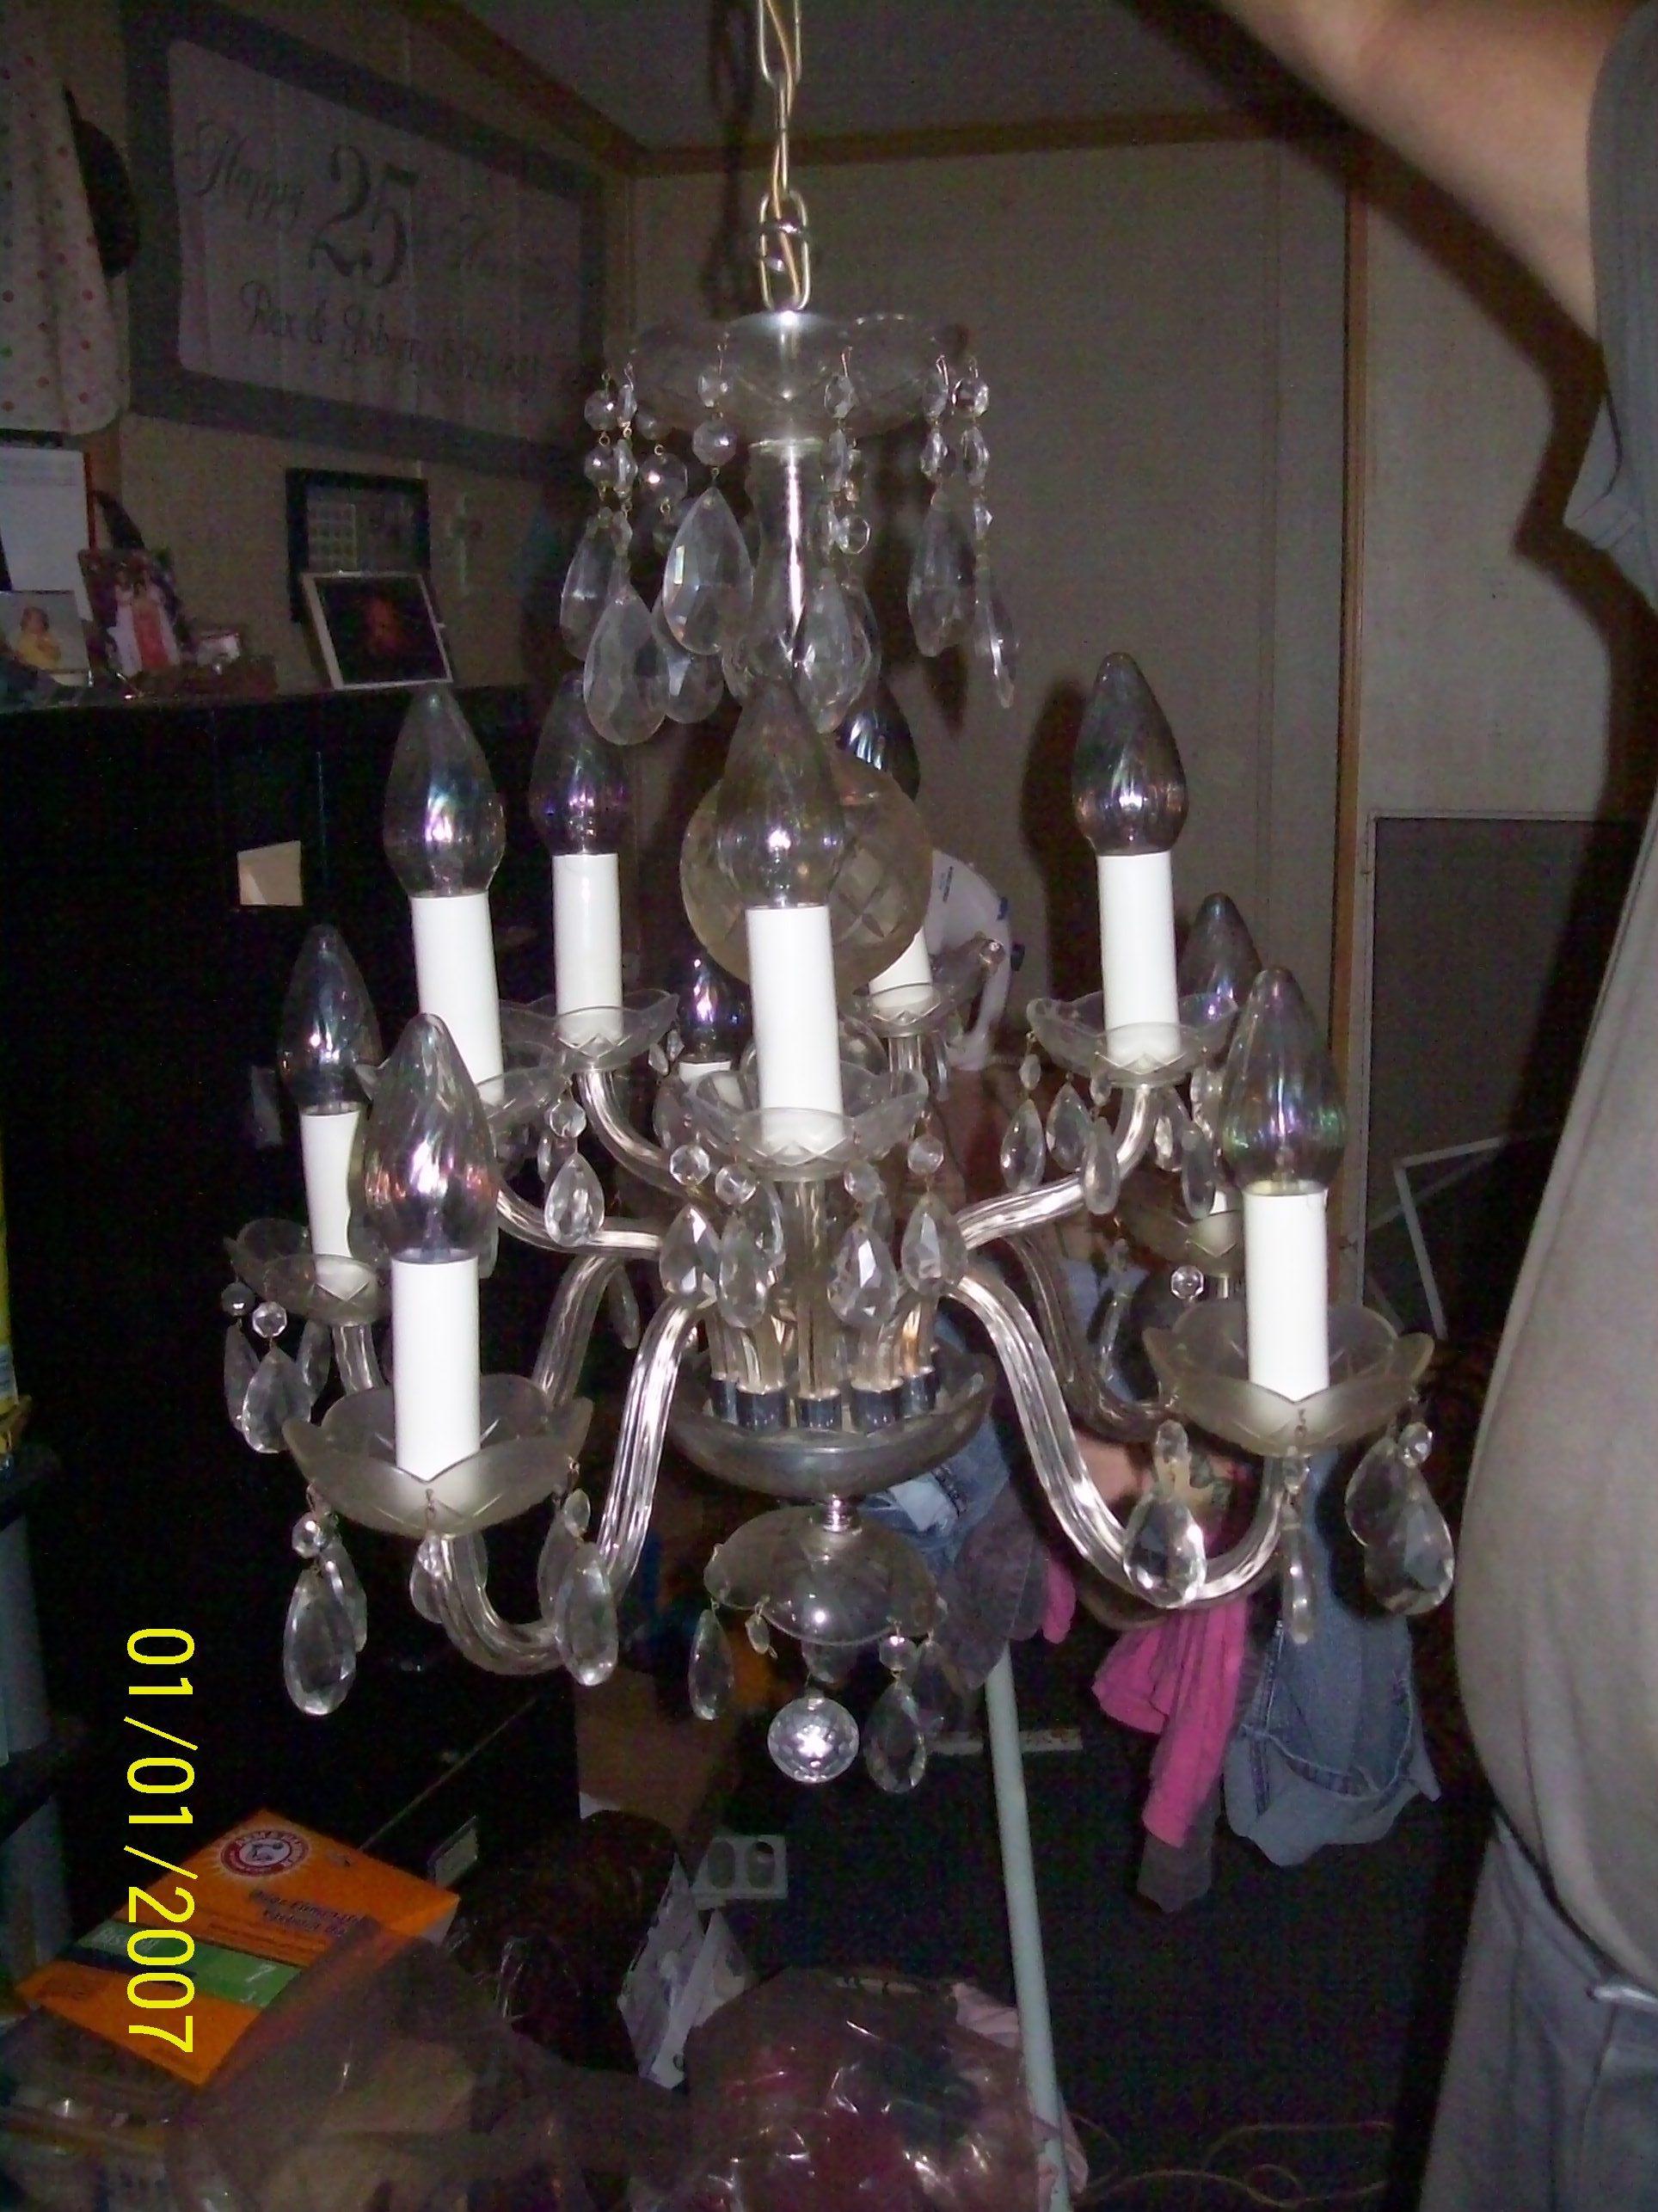 Vintage chandelier antique appraisal instappraisal vintage chandelier arubaitofo Image collections